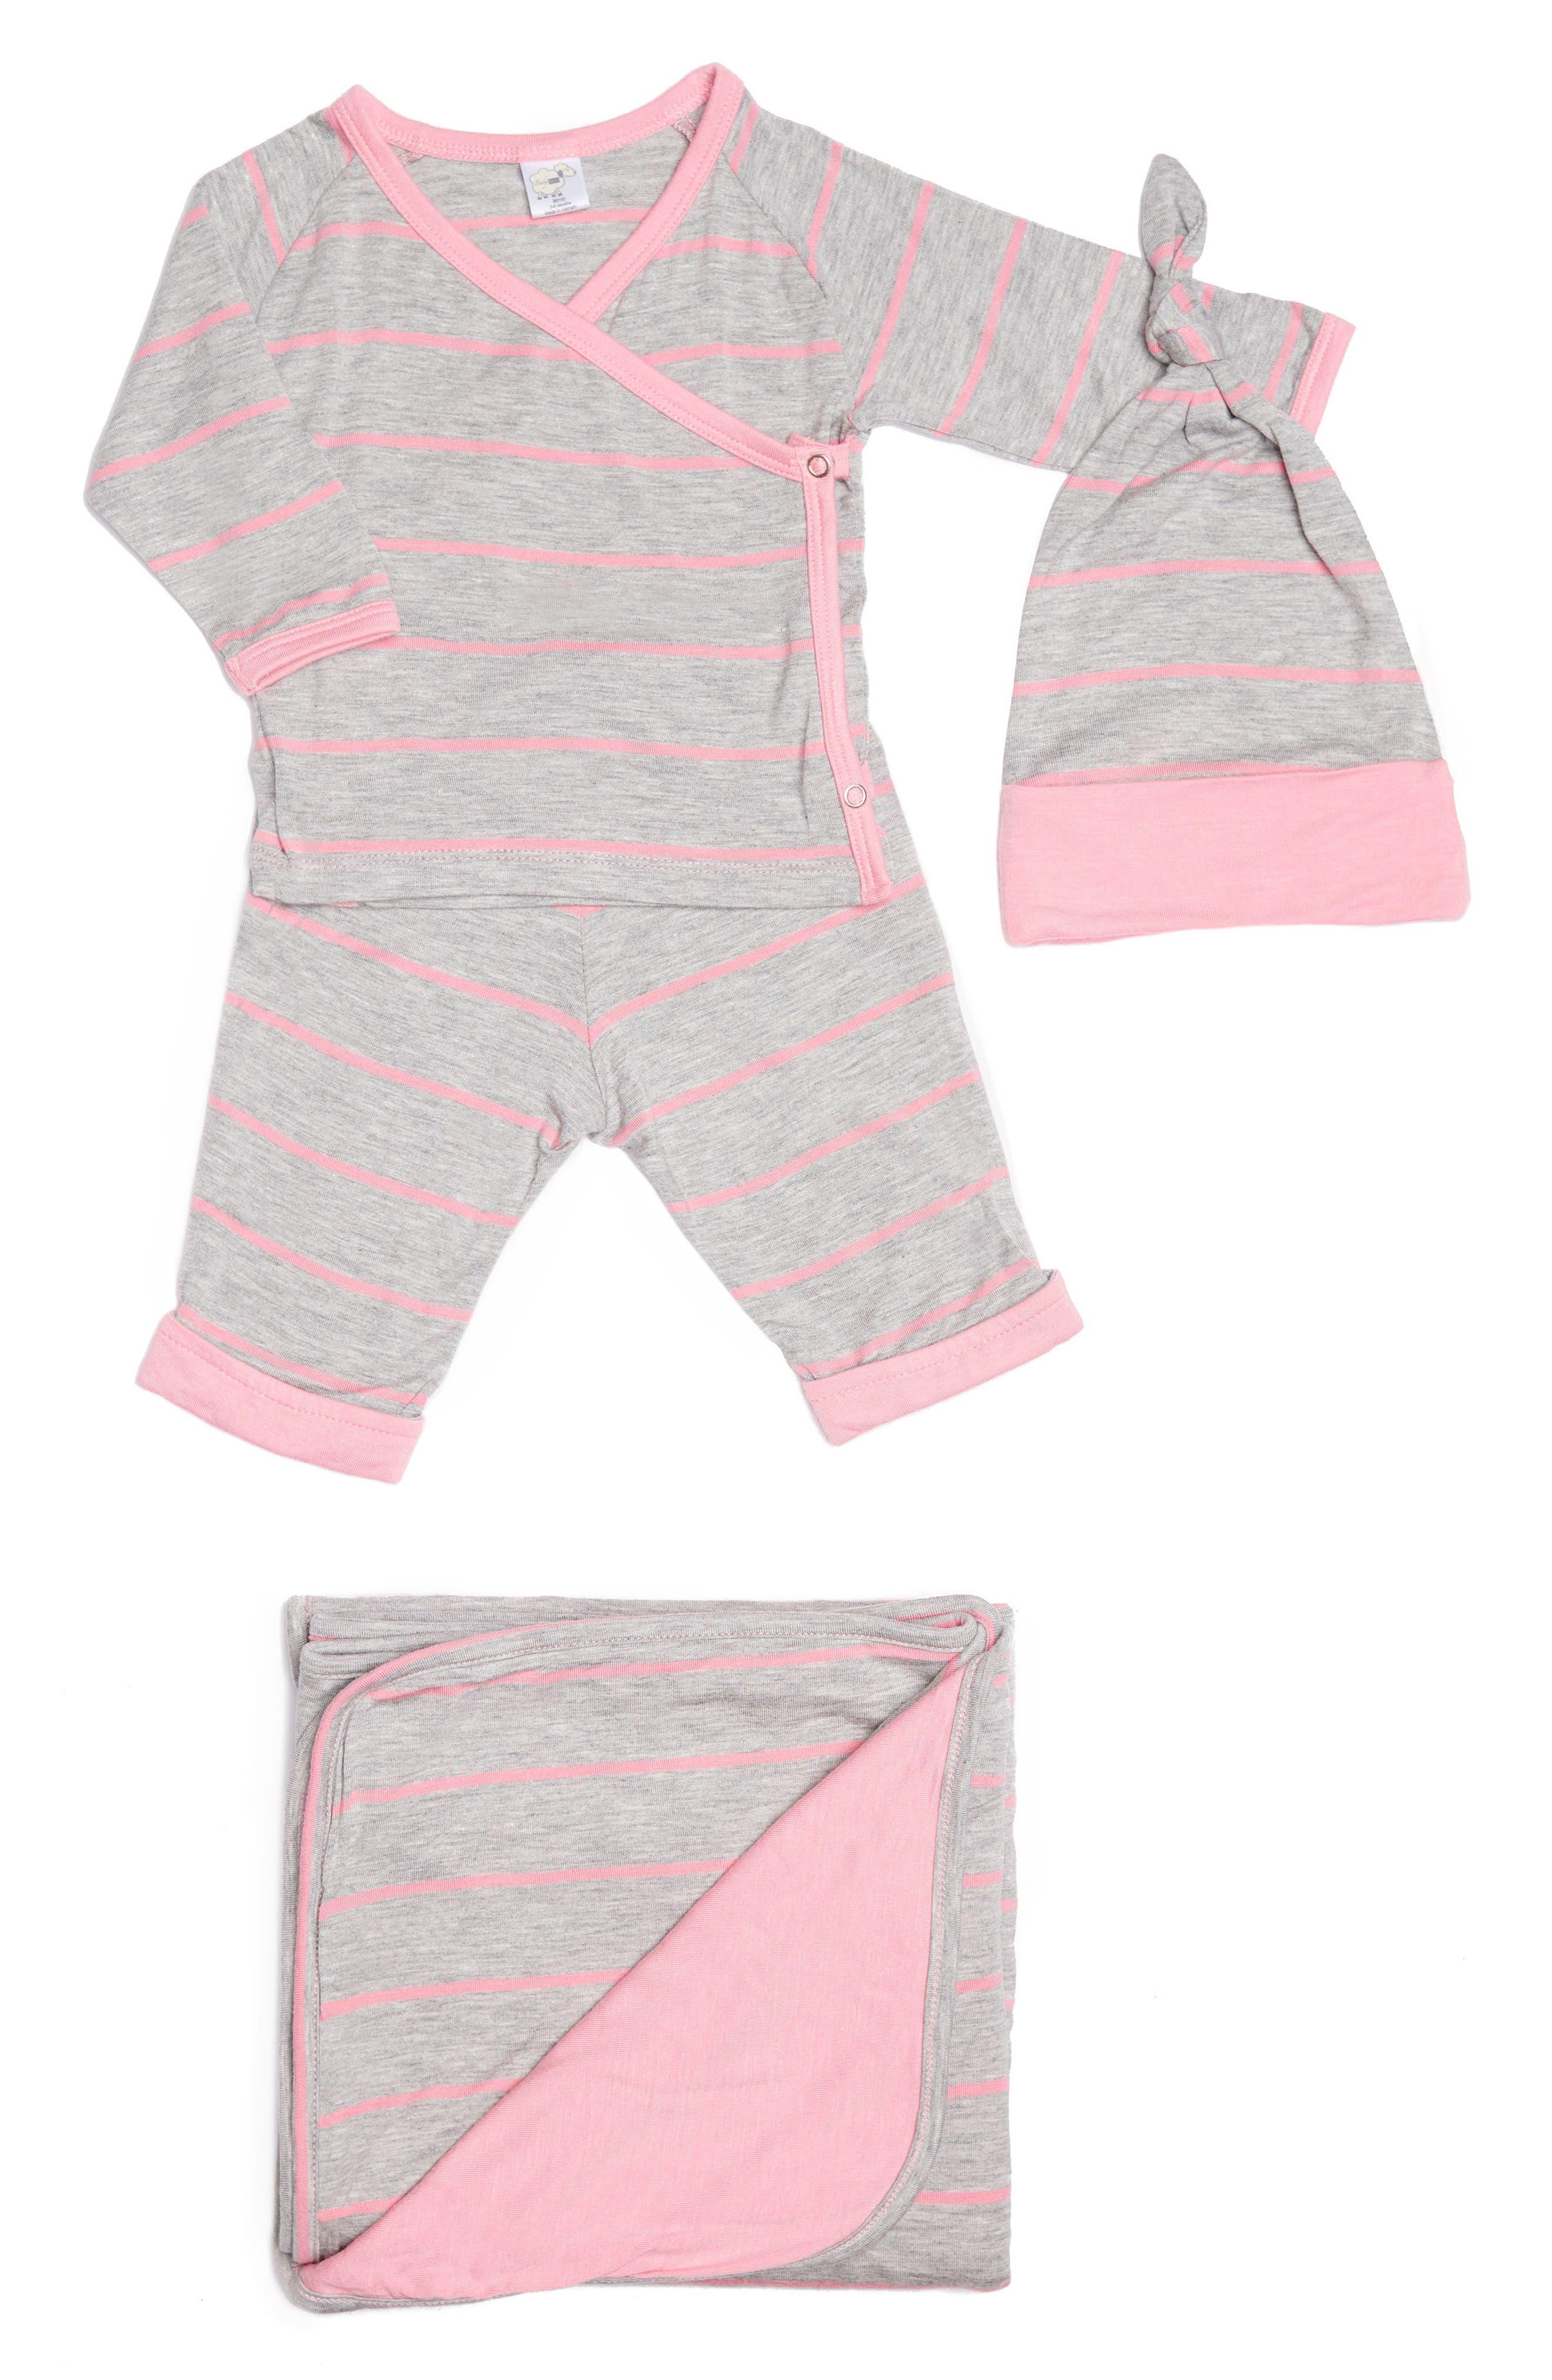 Alternate Image 1 Selected - Baby Grey Kimono Top, Pants, Beanie & Receiving Blanket Set (Baby Girls)